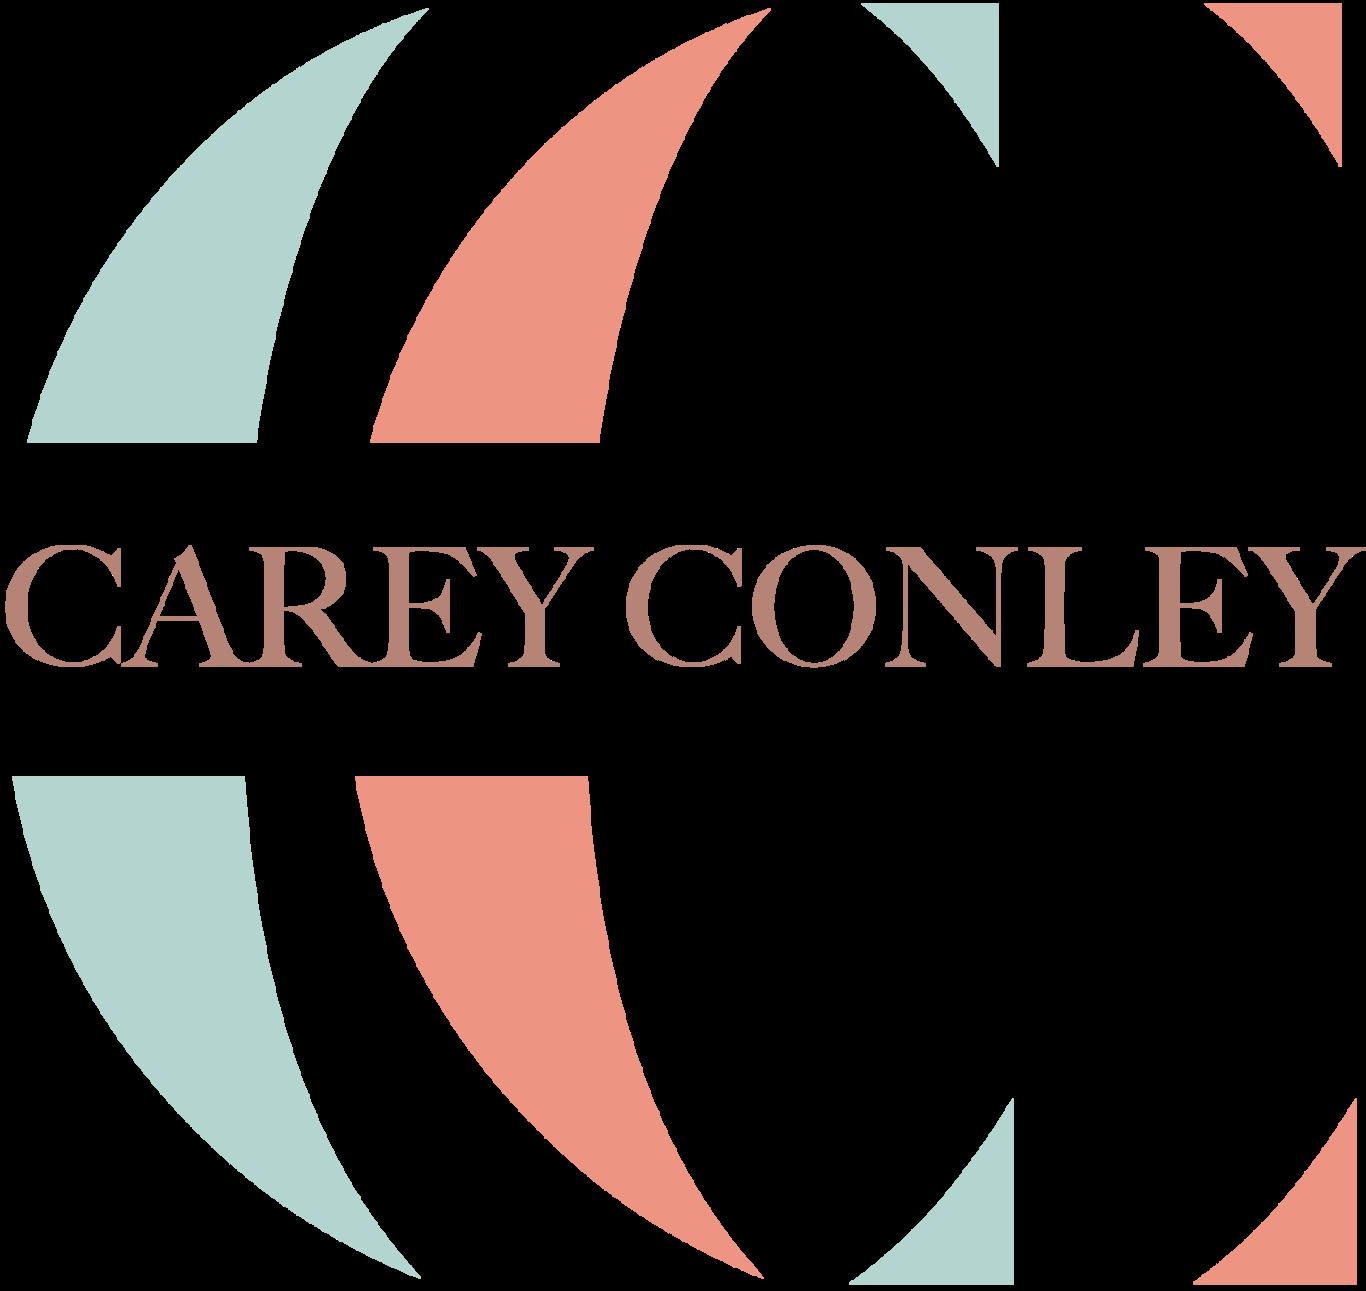 Carey Conley Logo